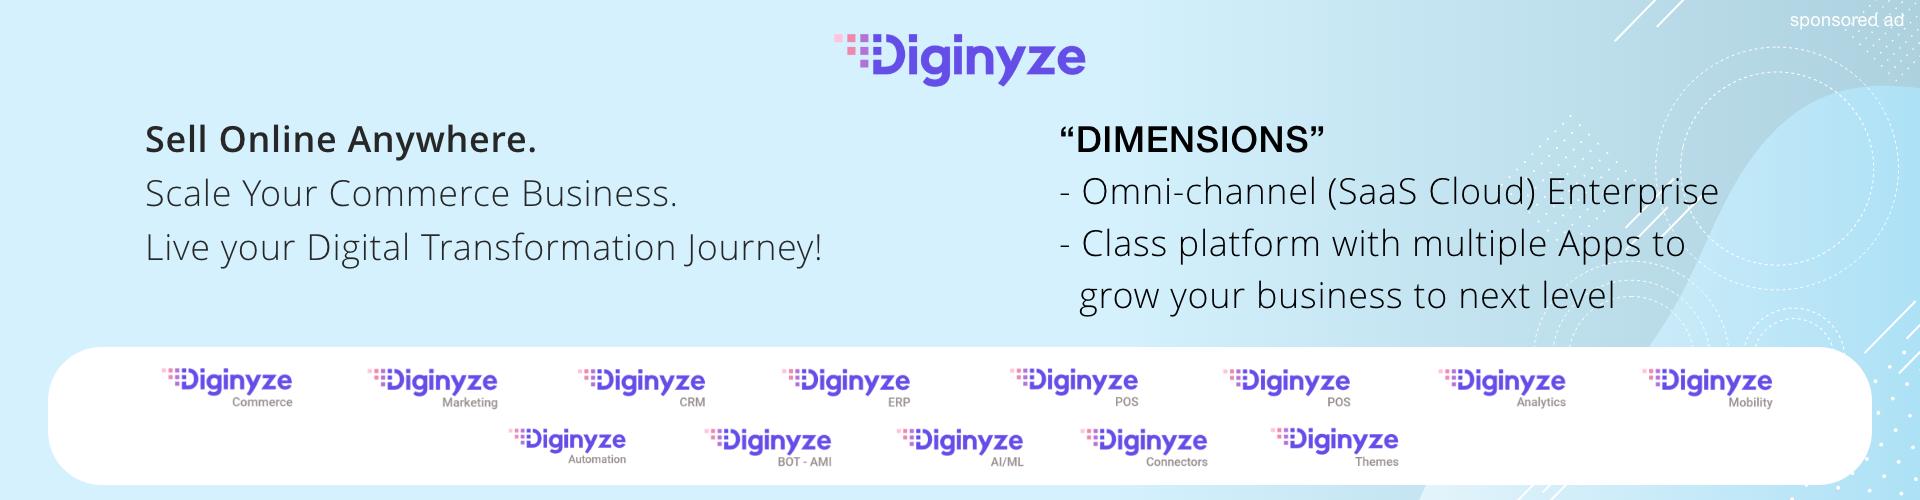 Futurism Dimensions